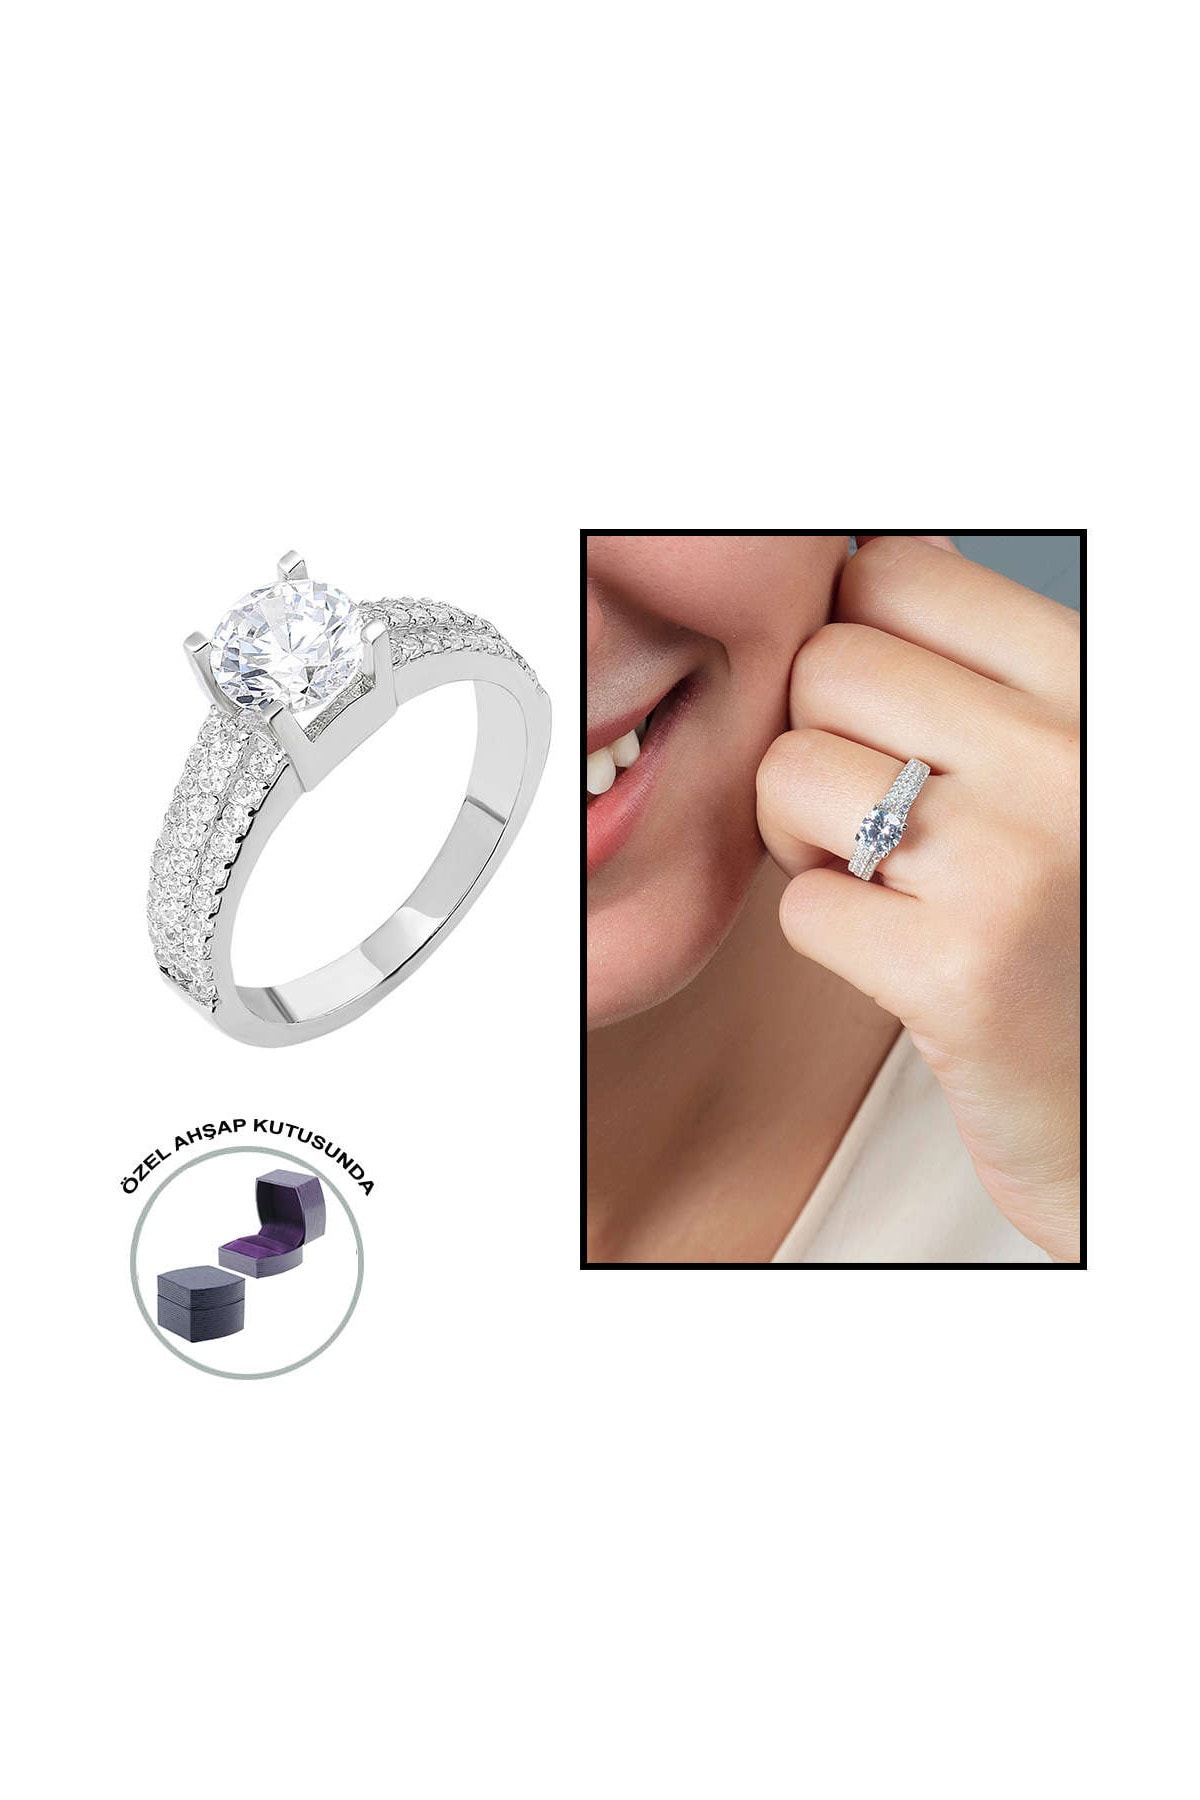 Tesbihane Starlight Diamond Pırlanta Montür Üç Sıralı 925 Ayar Gümüş Bayan Tektaş Yüzük 102001802